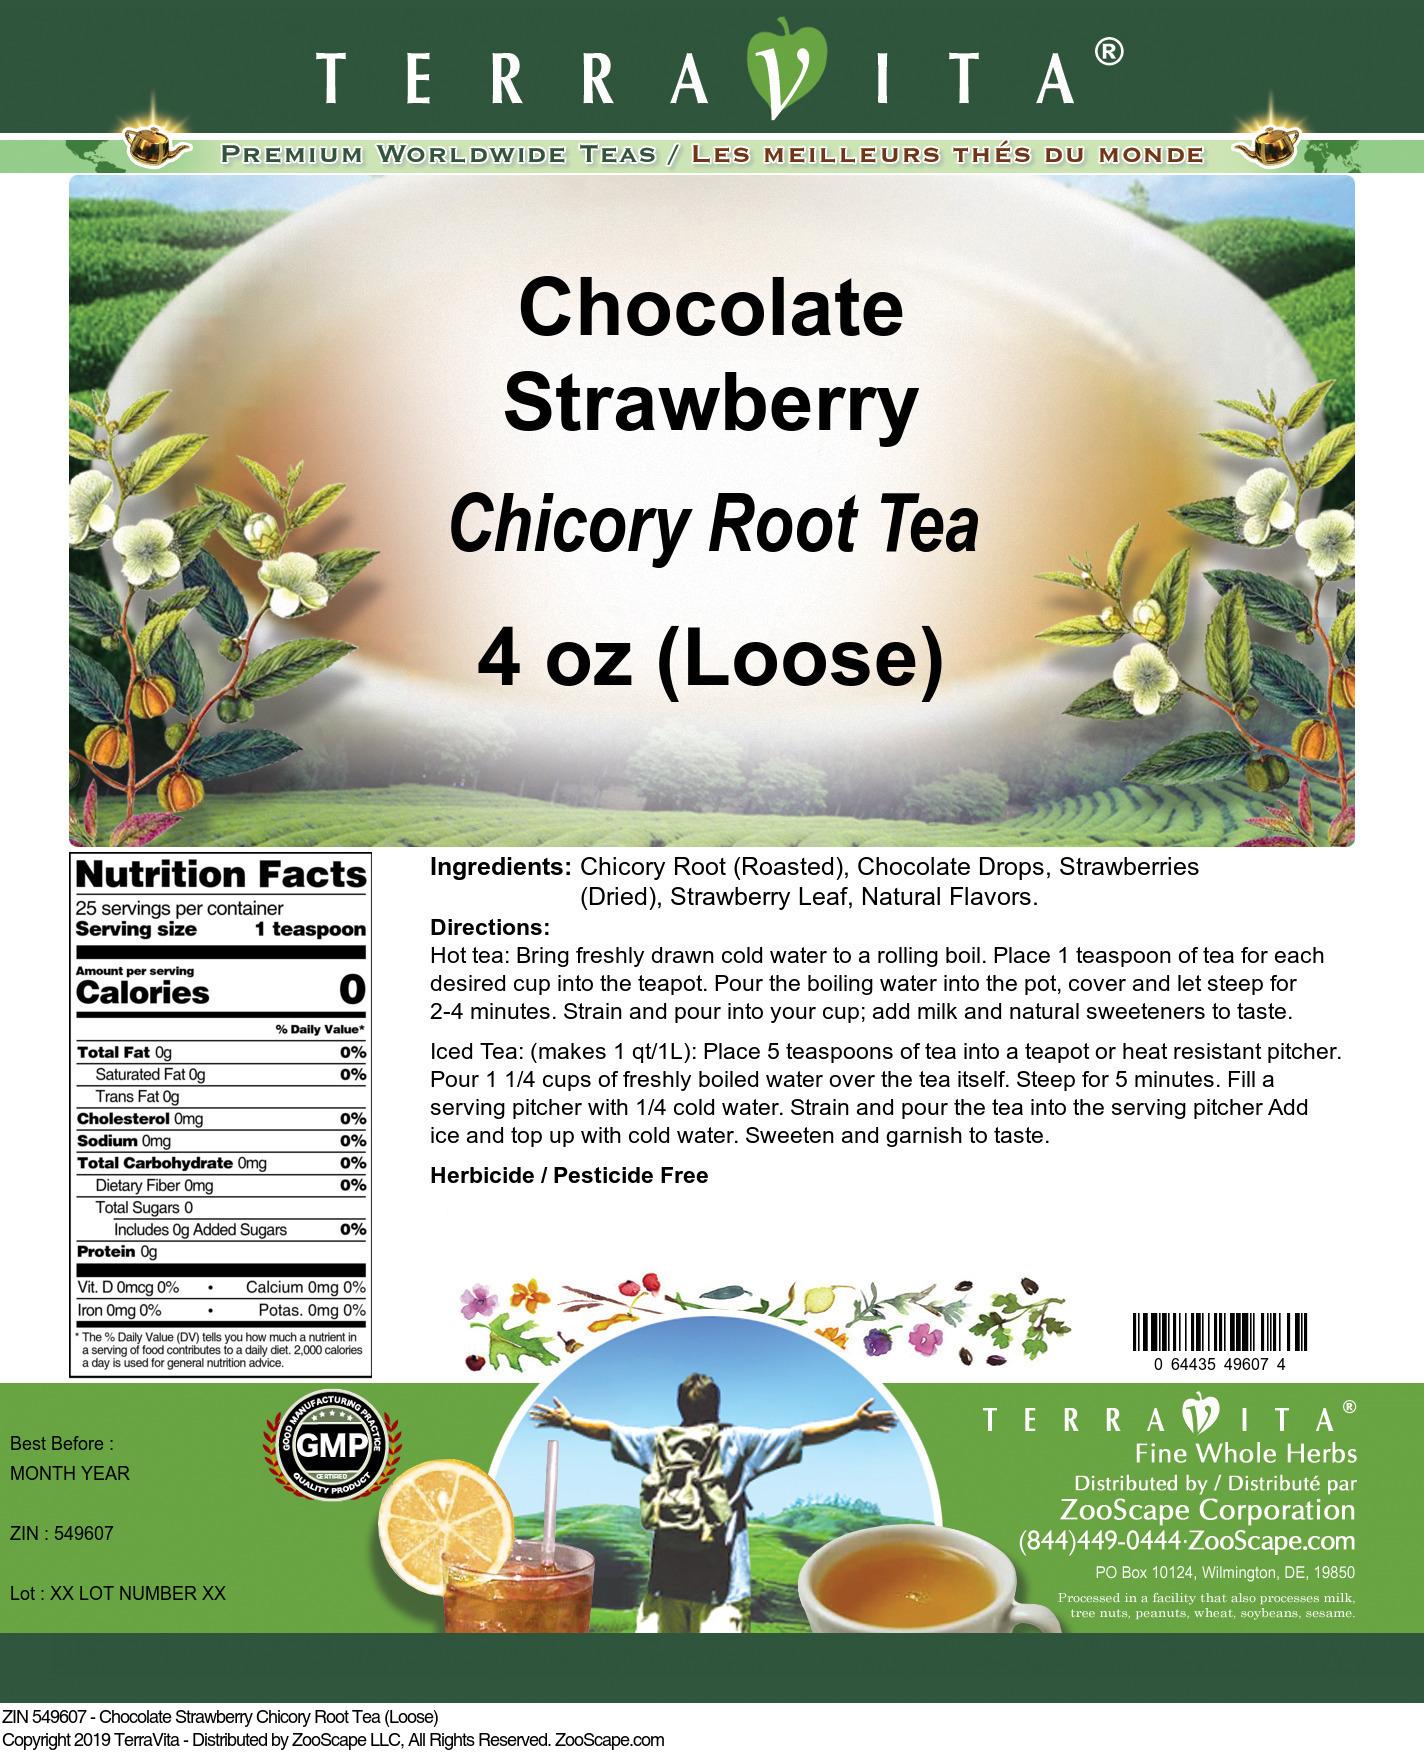 Chocolate Strawberry Chicory Root Tea (Loose)